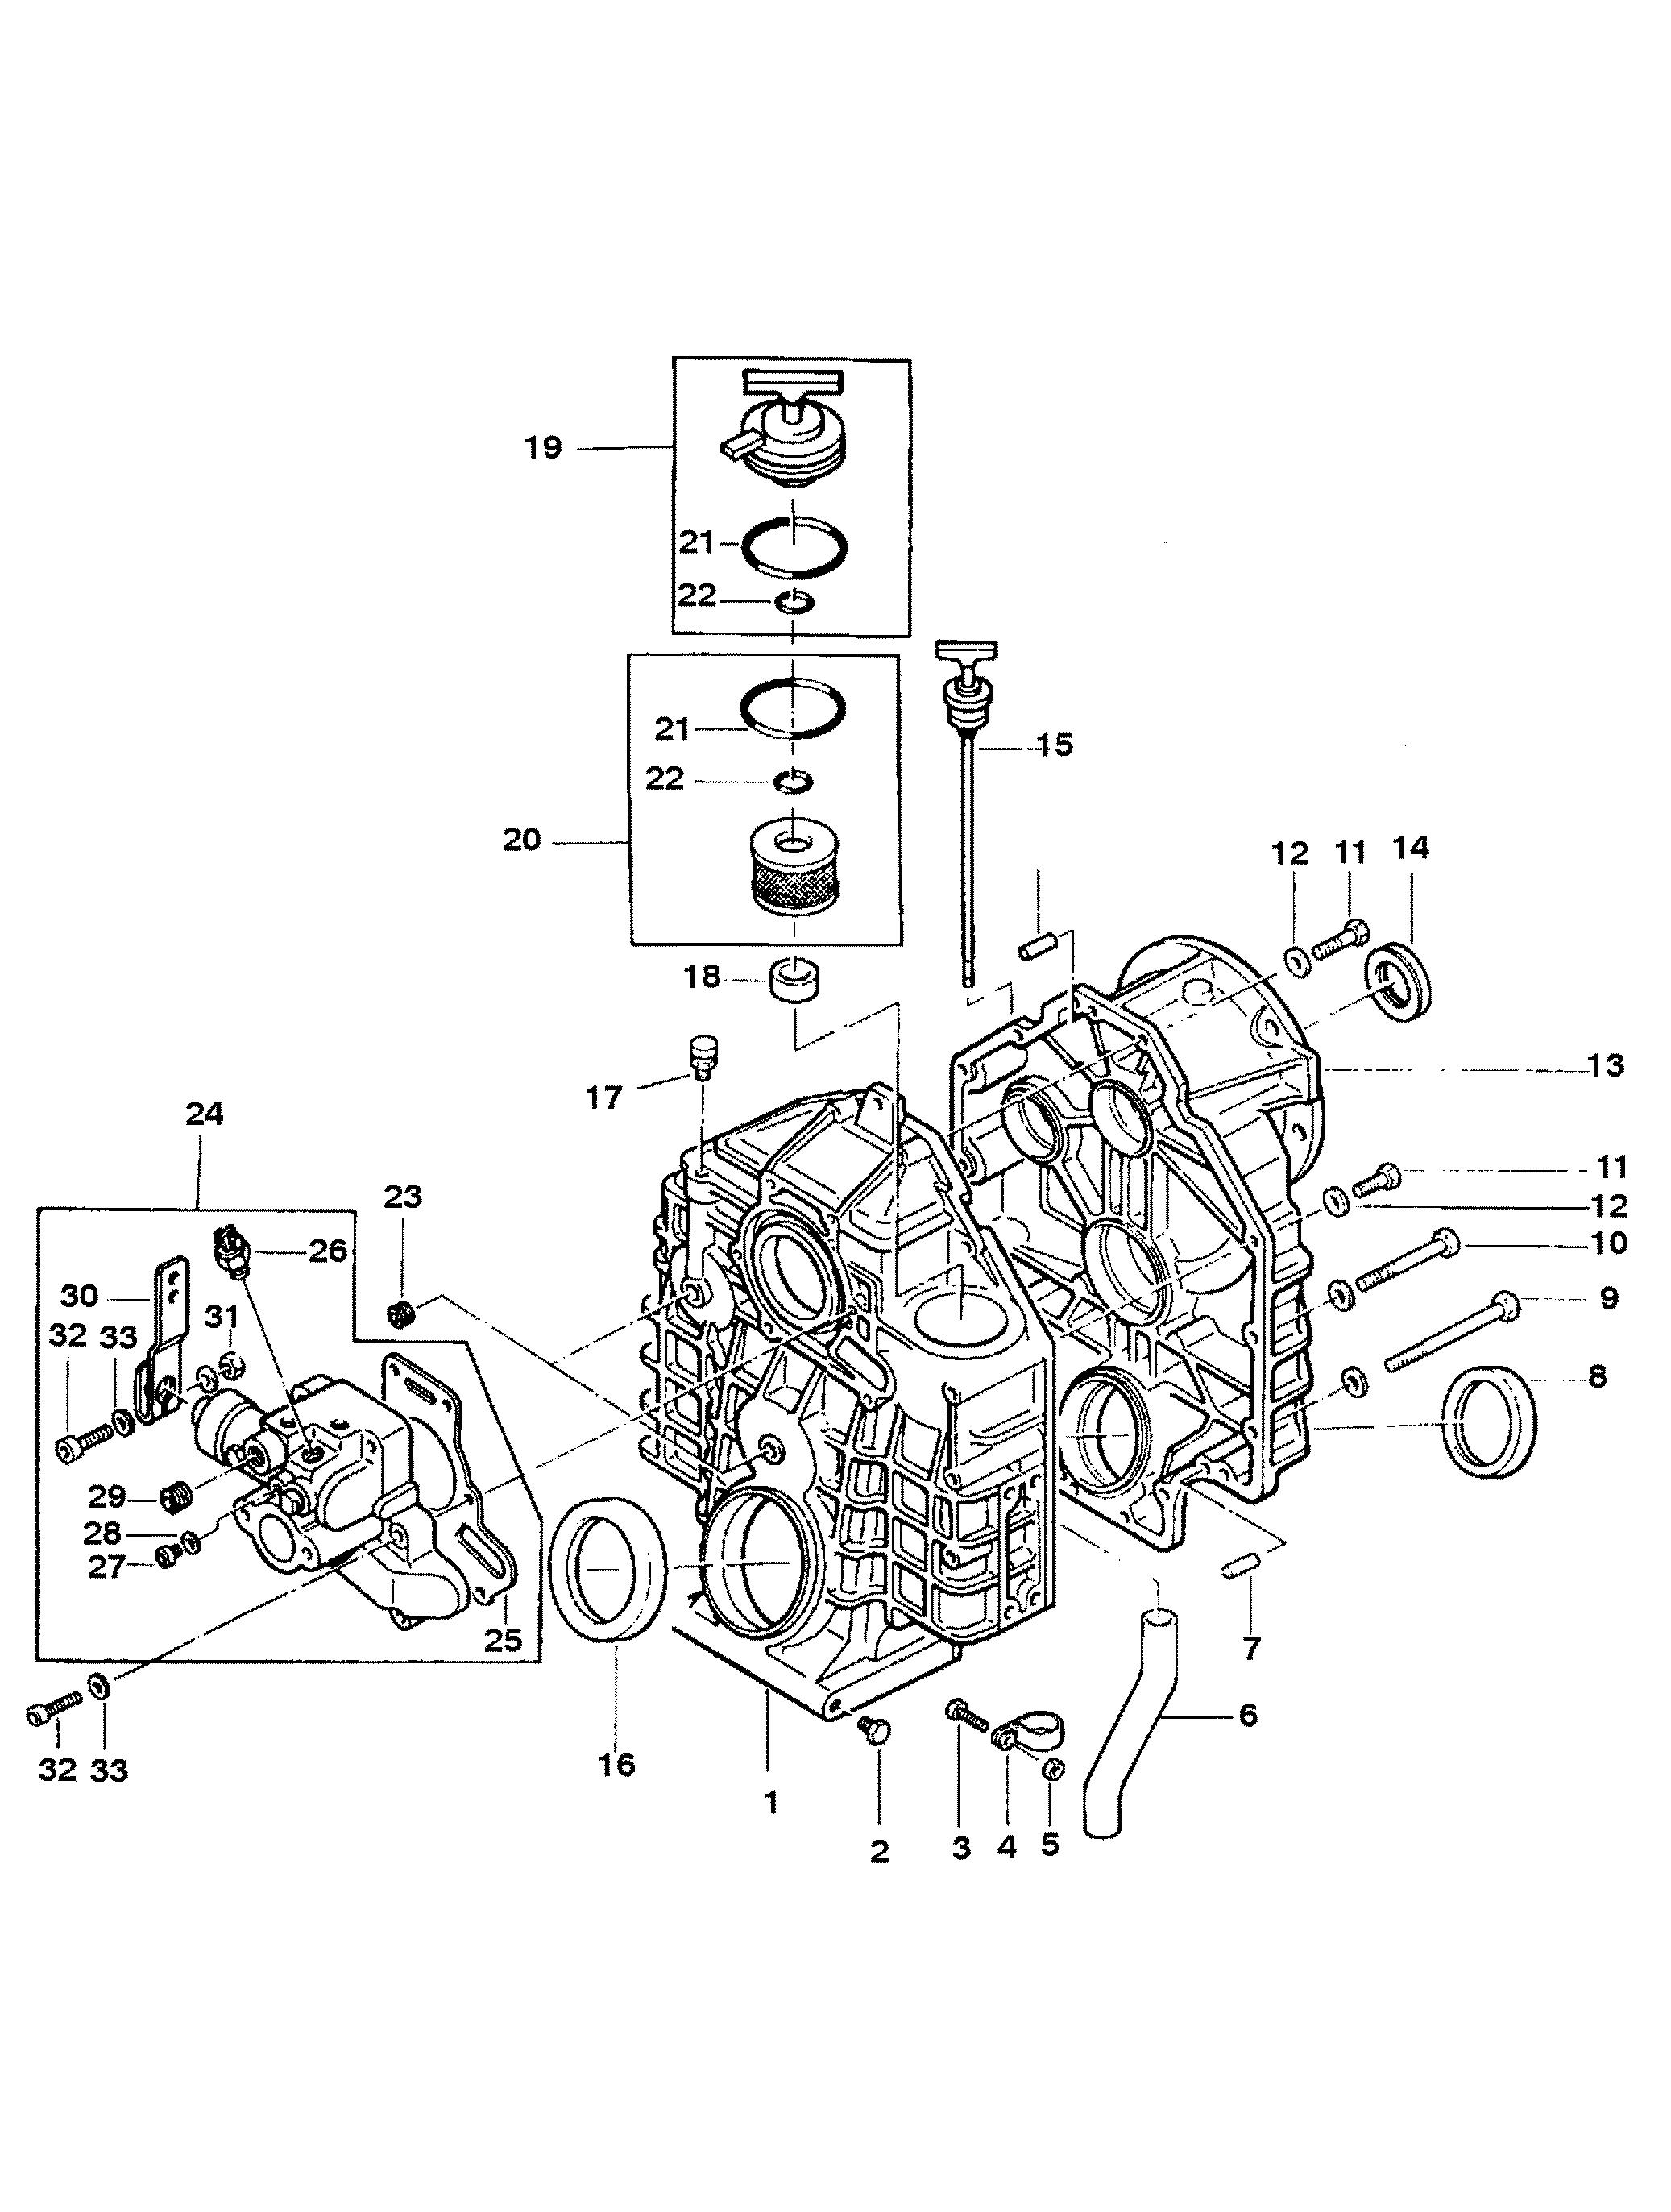 mercedes sprinter engine manual